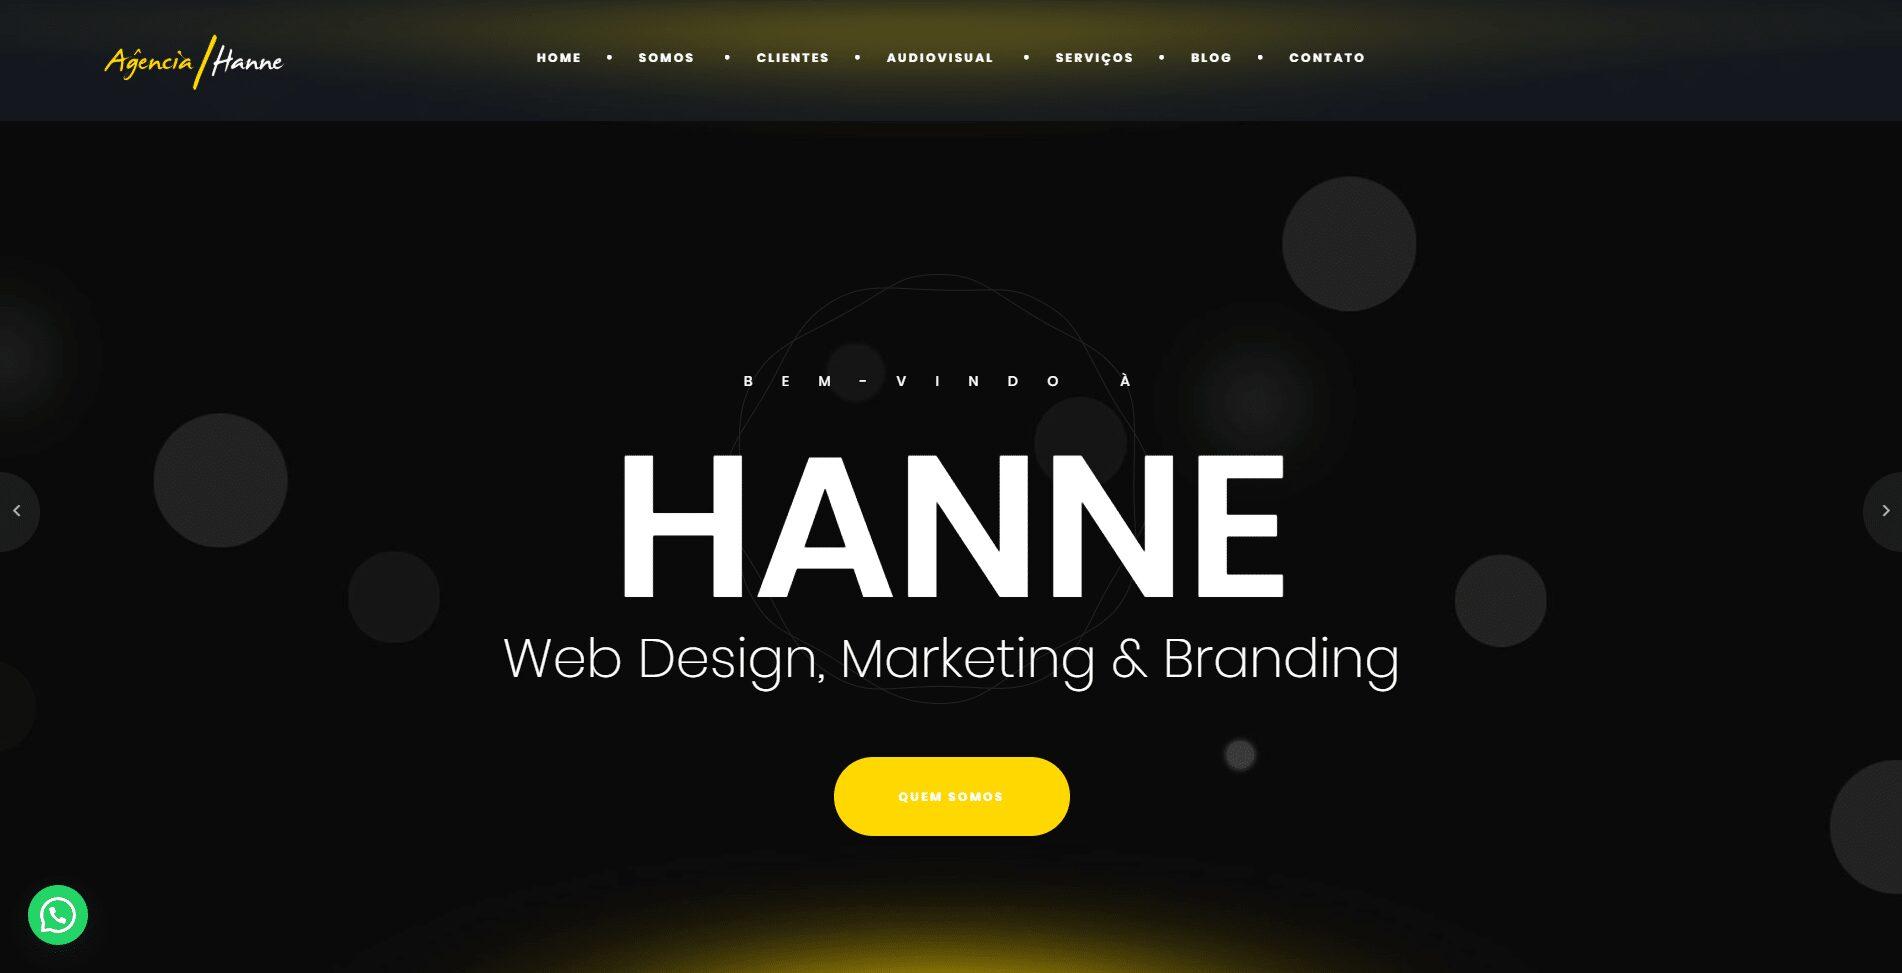 Website Agência Hanne